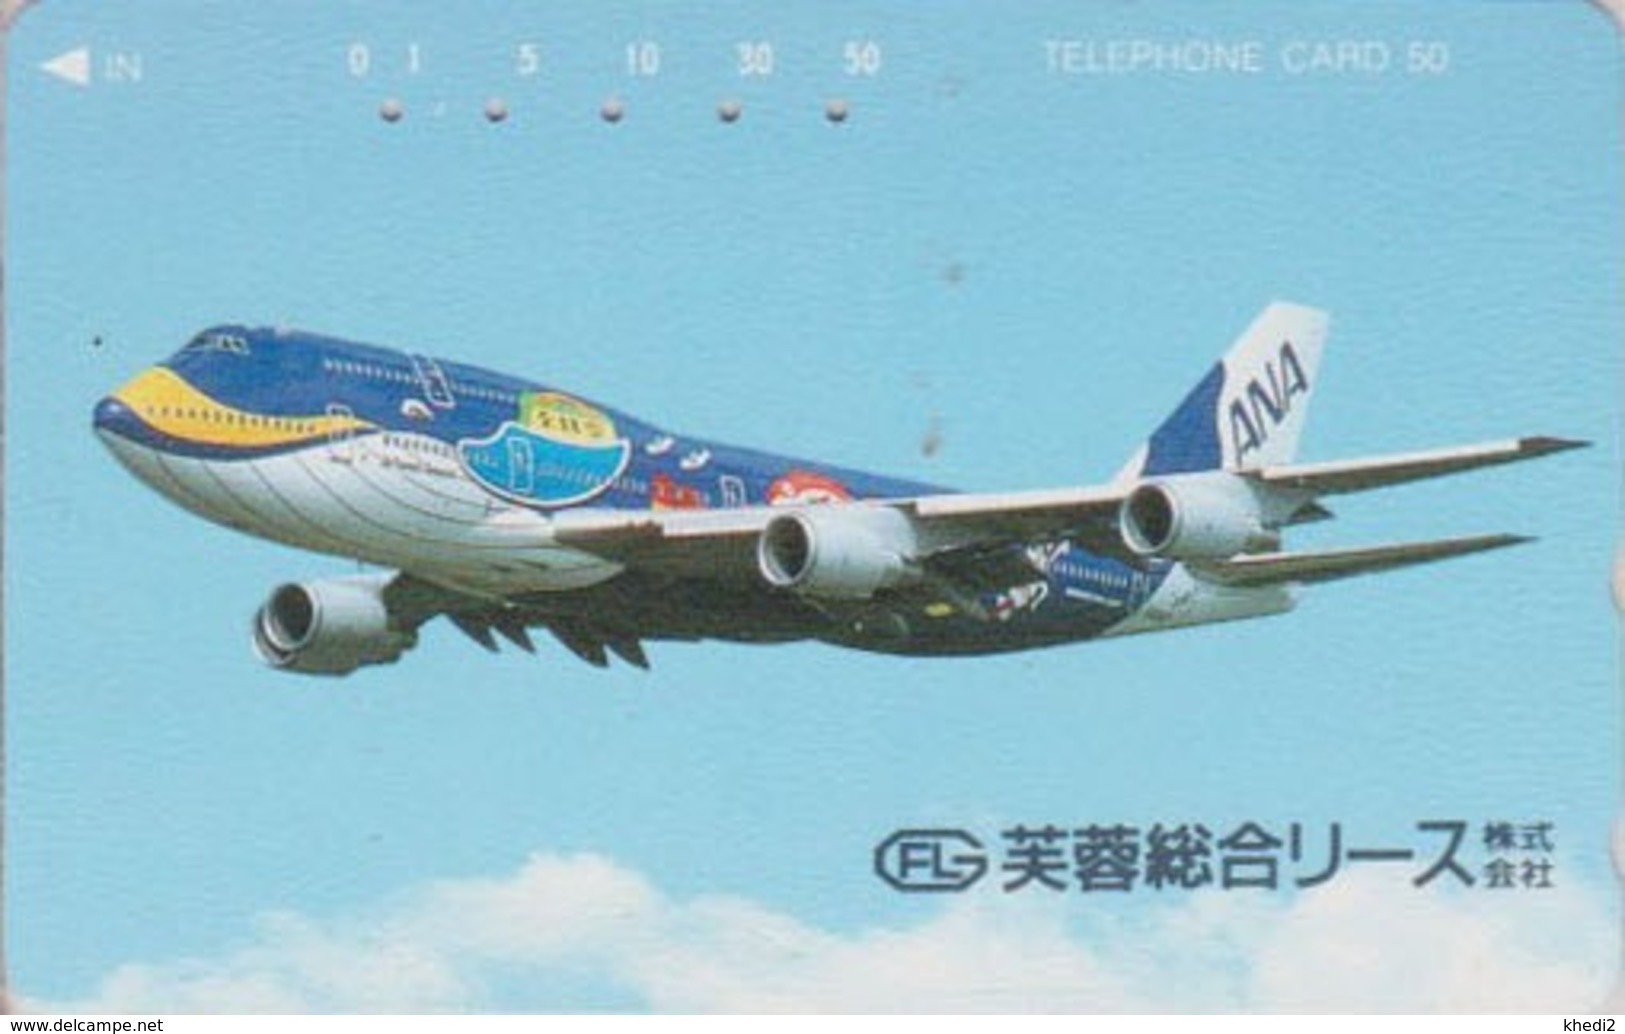 Télécarte Japon / 110-011 - AVION - ANA  ** MARINE JUMBO ** - PLANE Japan Phonecard - Aviation 2302 - Aviones